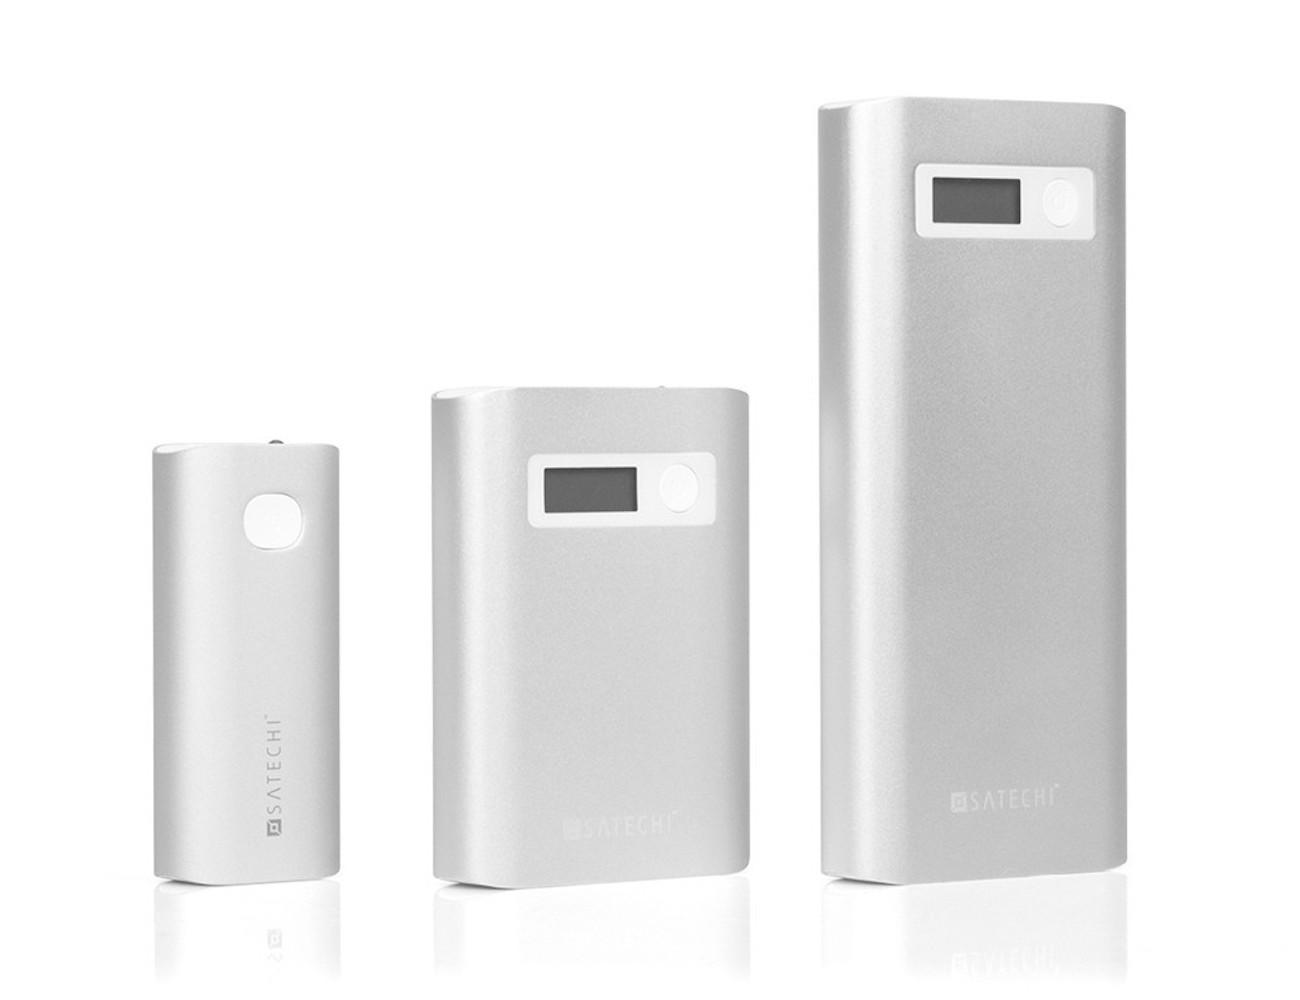 Satechi SX20 Aluminum Portable Energy Station